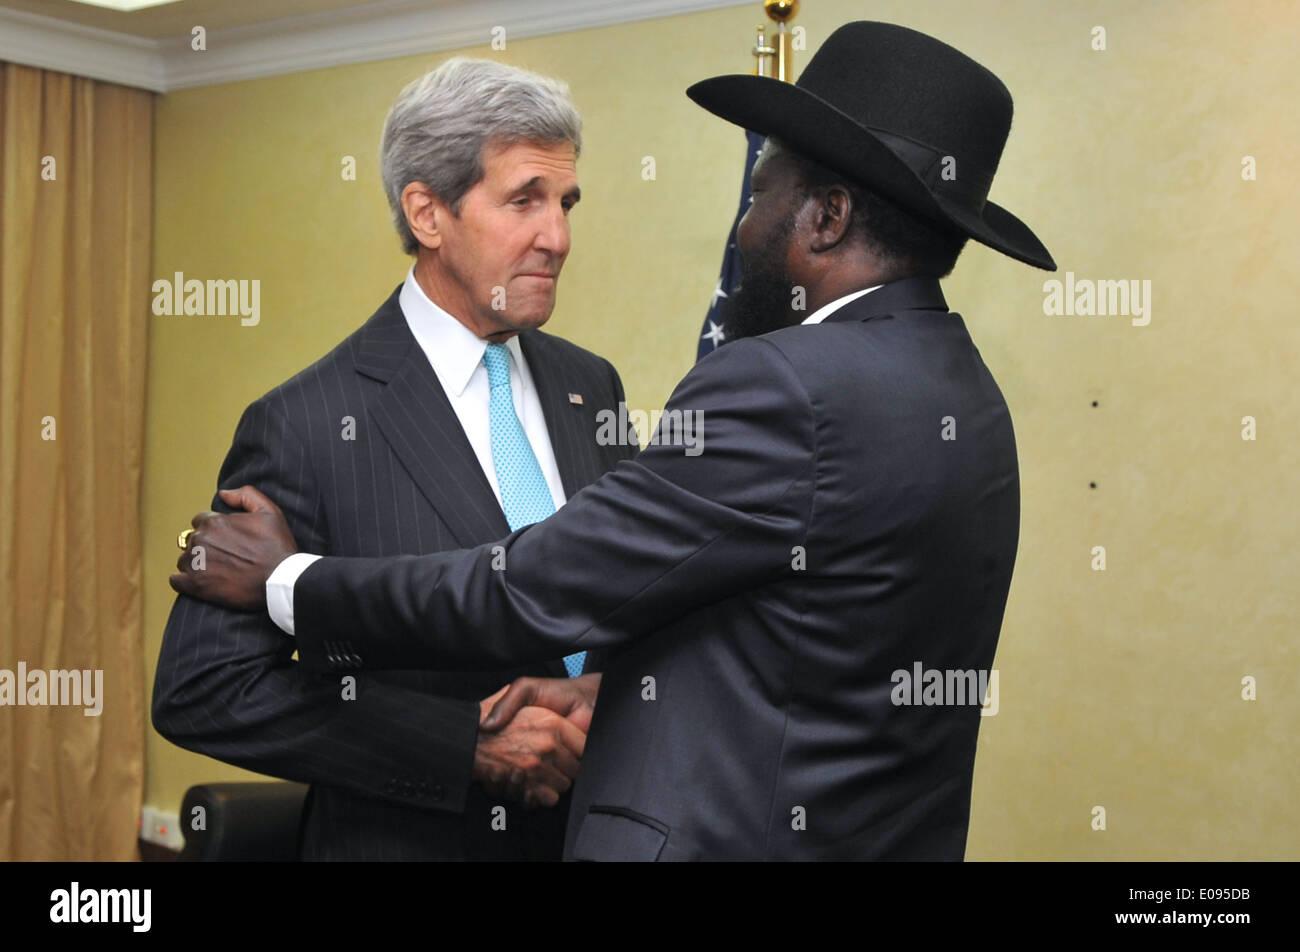 South Sudanese President Kiir Greets Secretary Kerry Before Meeting in Juba - Stock Image